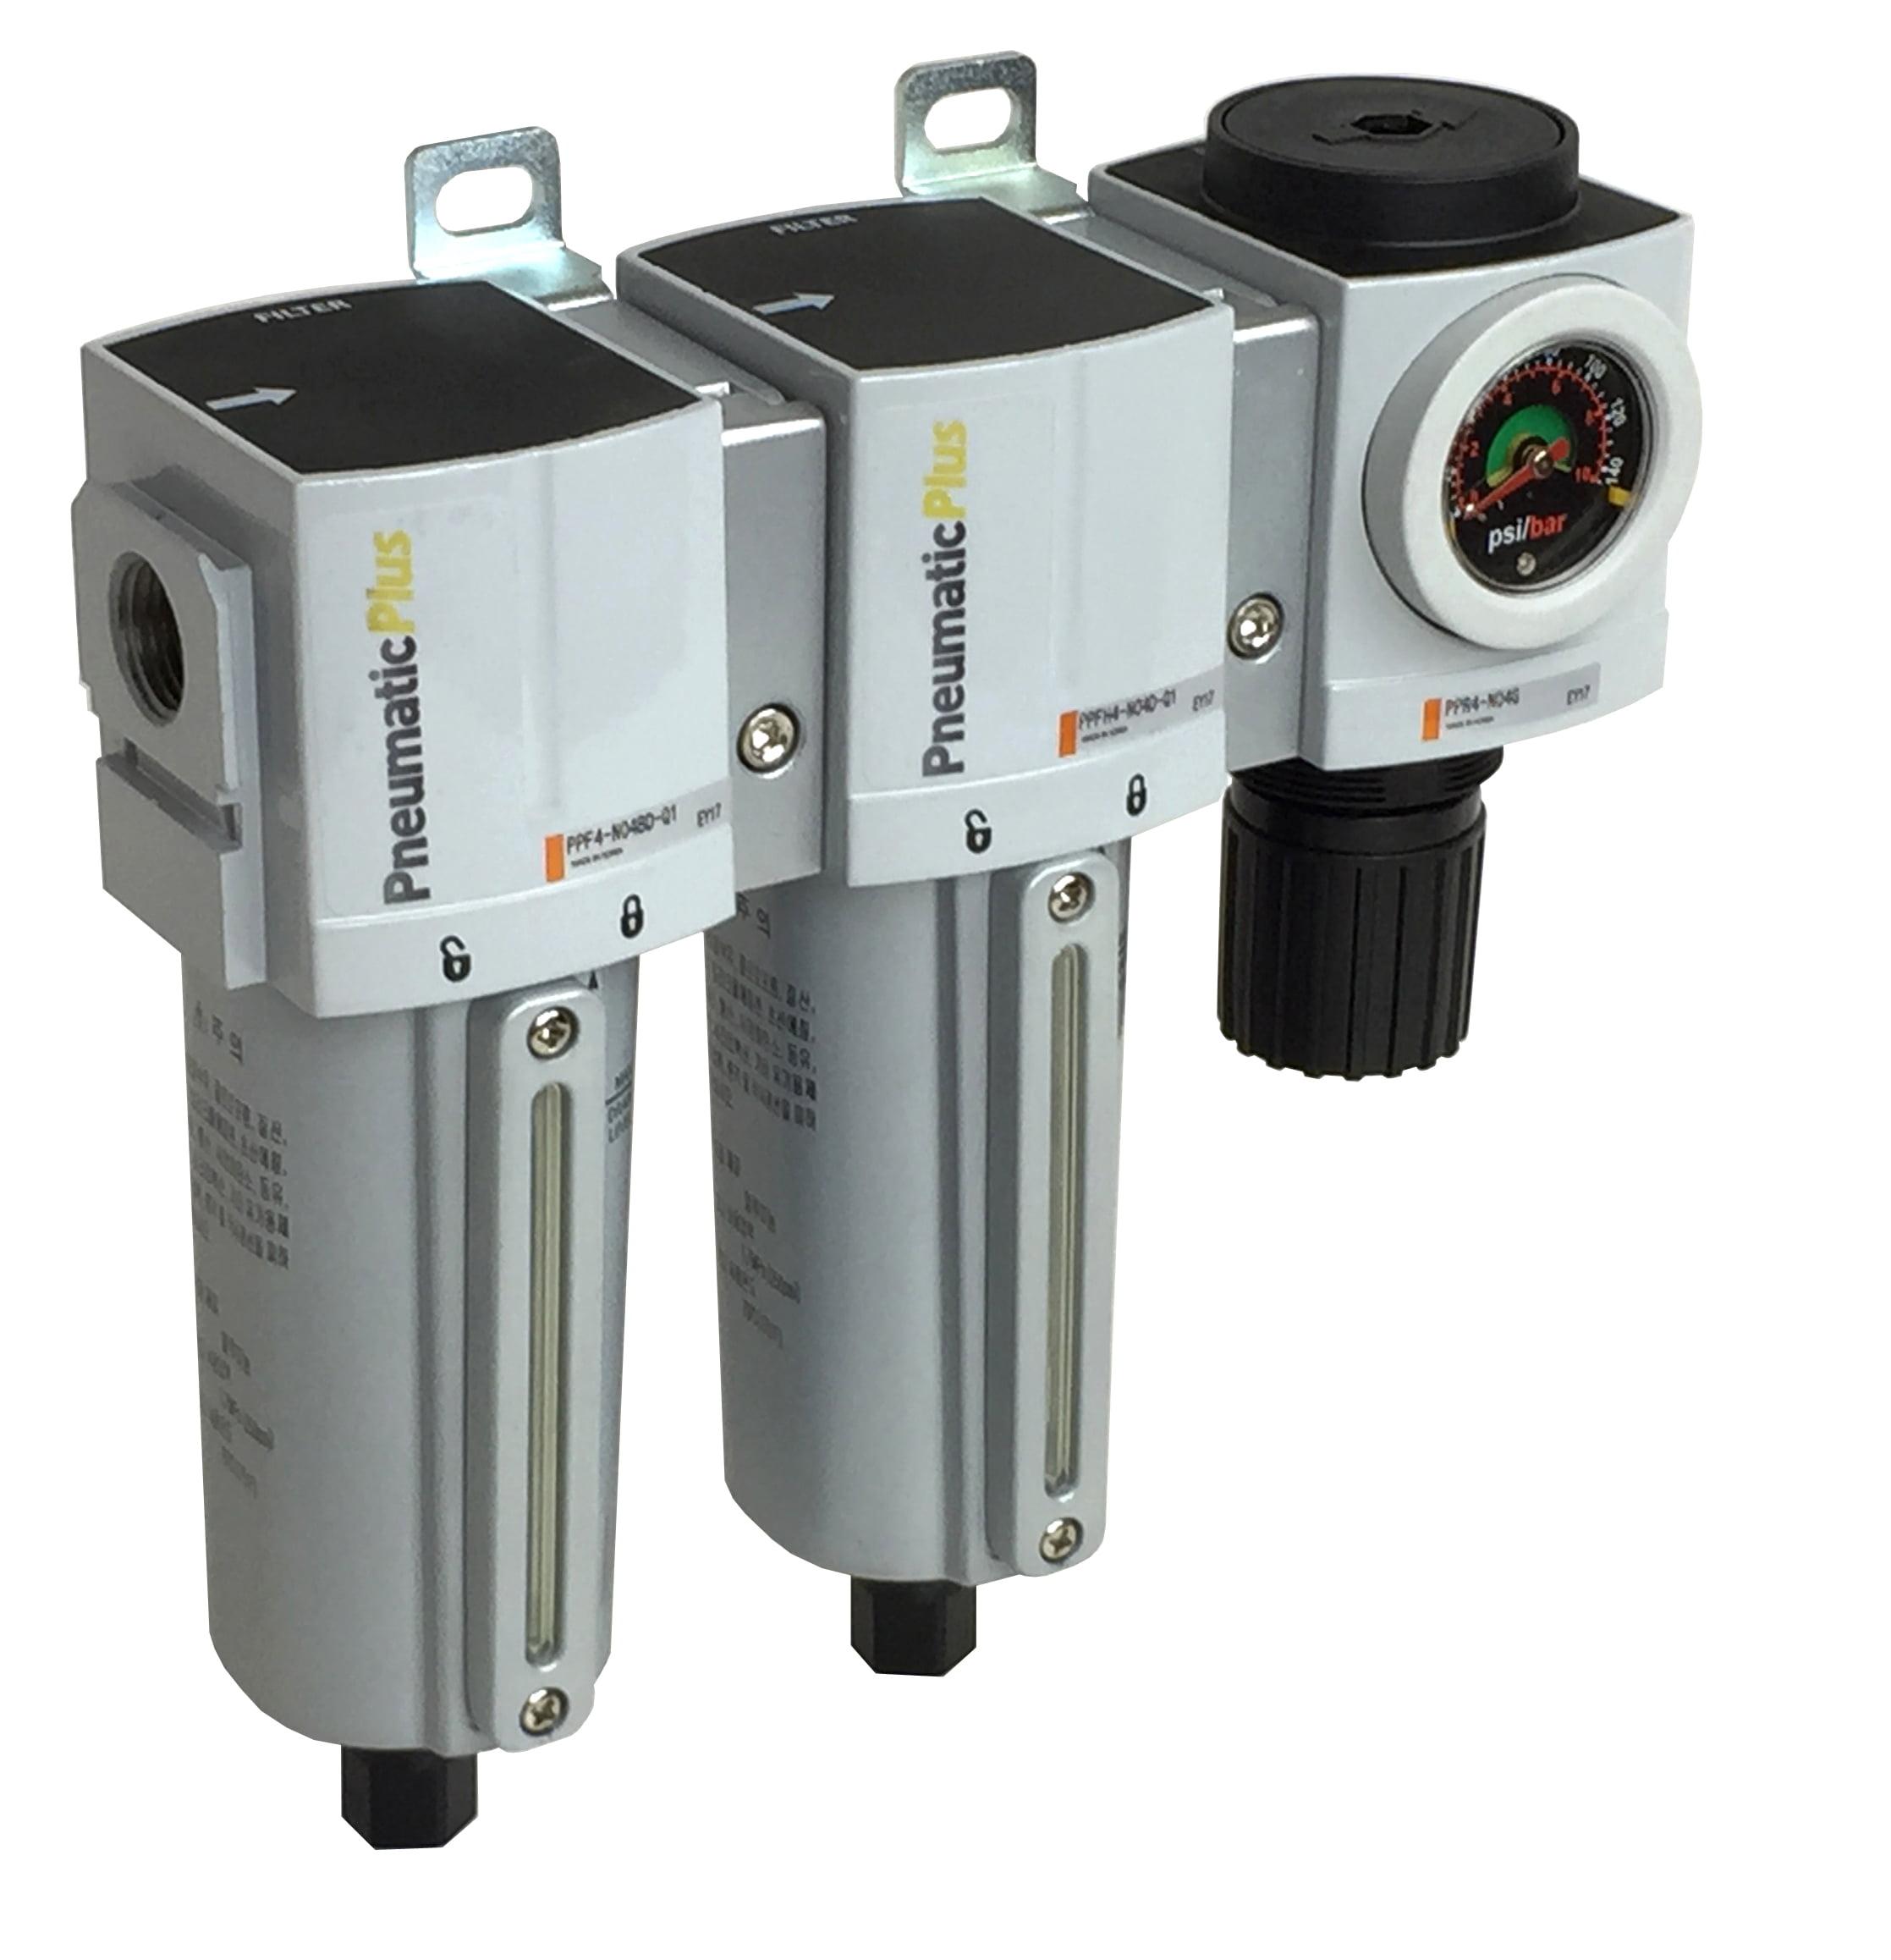 "PneumaticPlus PPC4C-N06DG-Q1 3-Stage Air Drying System, Particulate Air Filter (5 Micron), Coalescing Air Filter (0.3 Micron), Air Pressure Regulator Combo 3/4"" NPT, Auto Drain, Metal Bowl, Gauge"